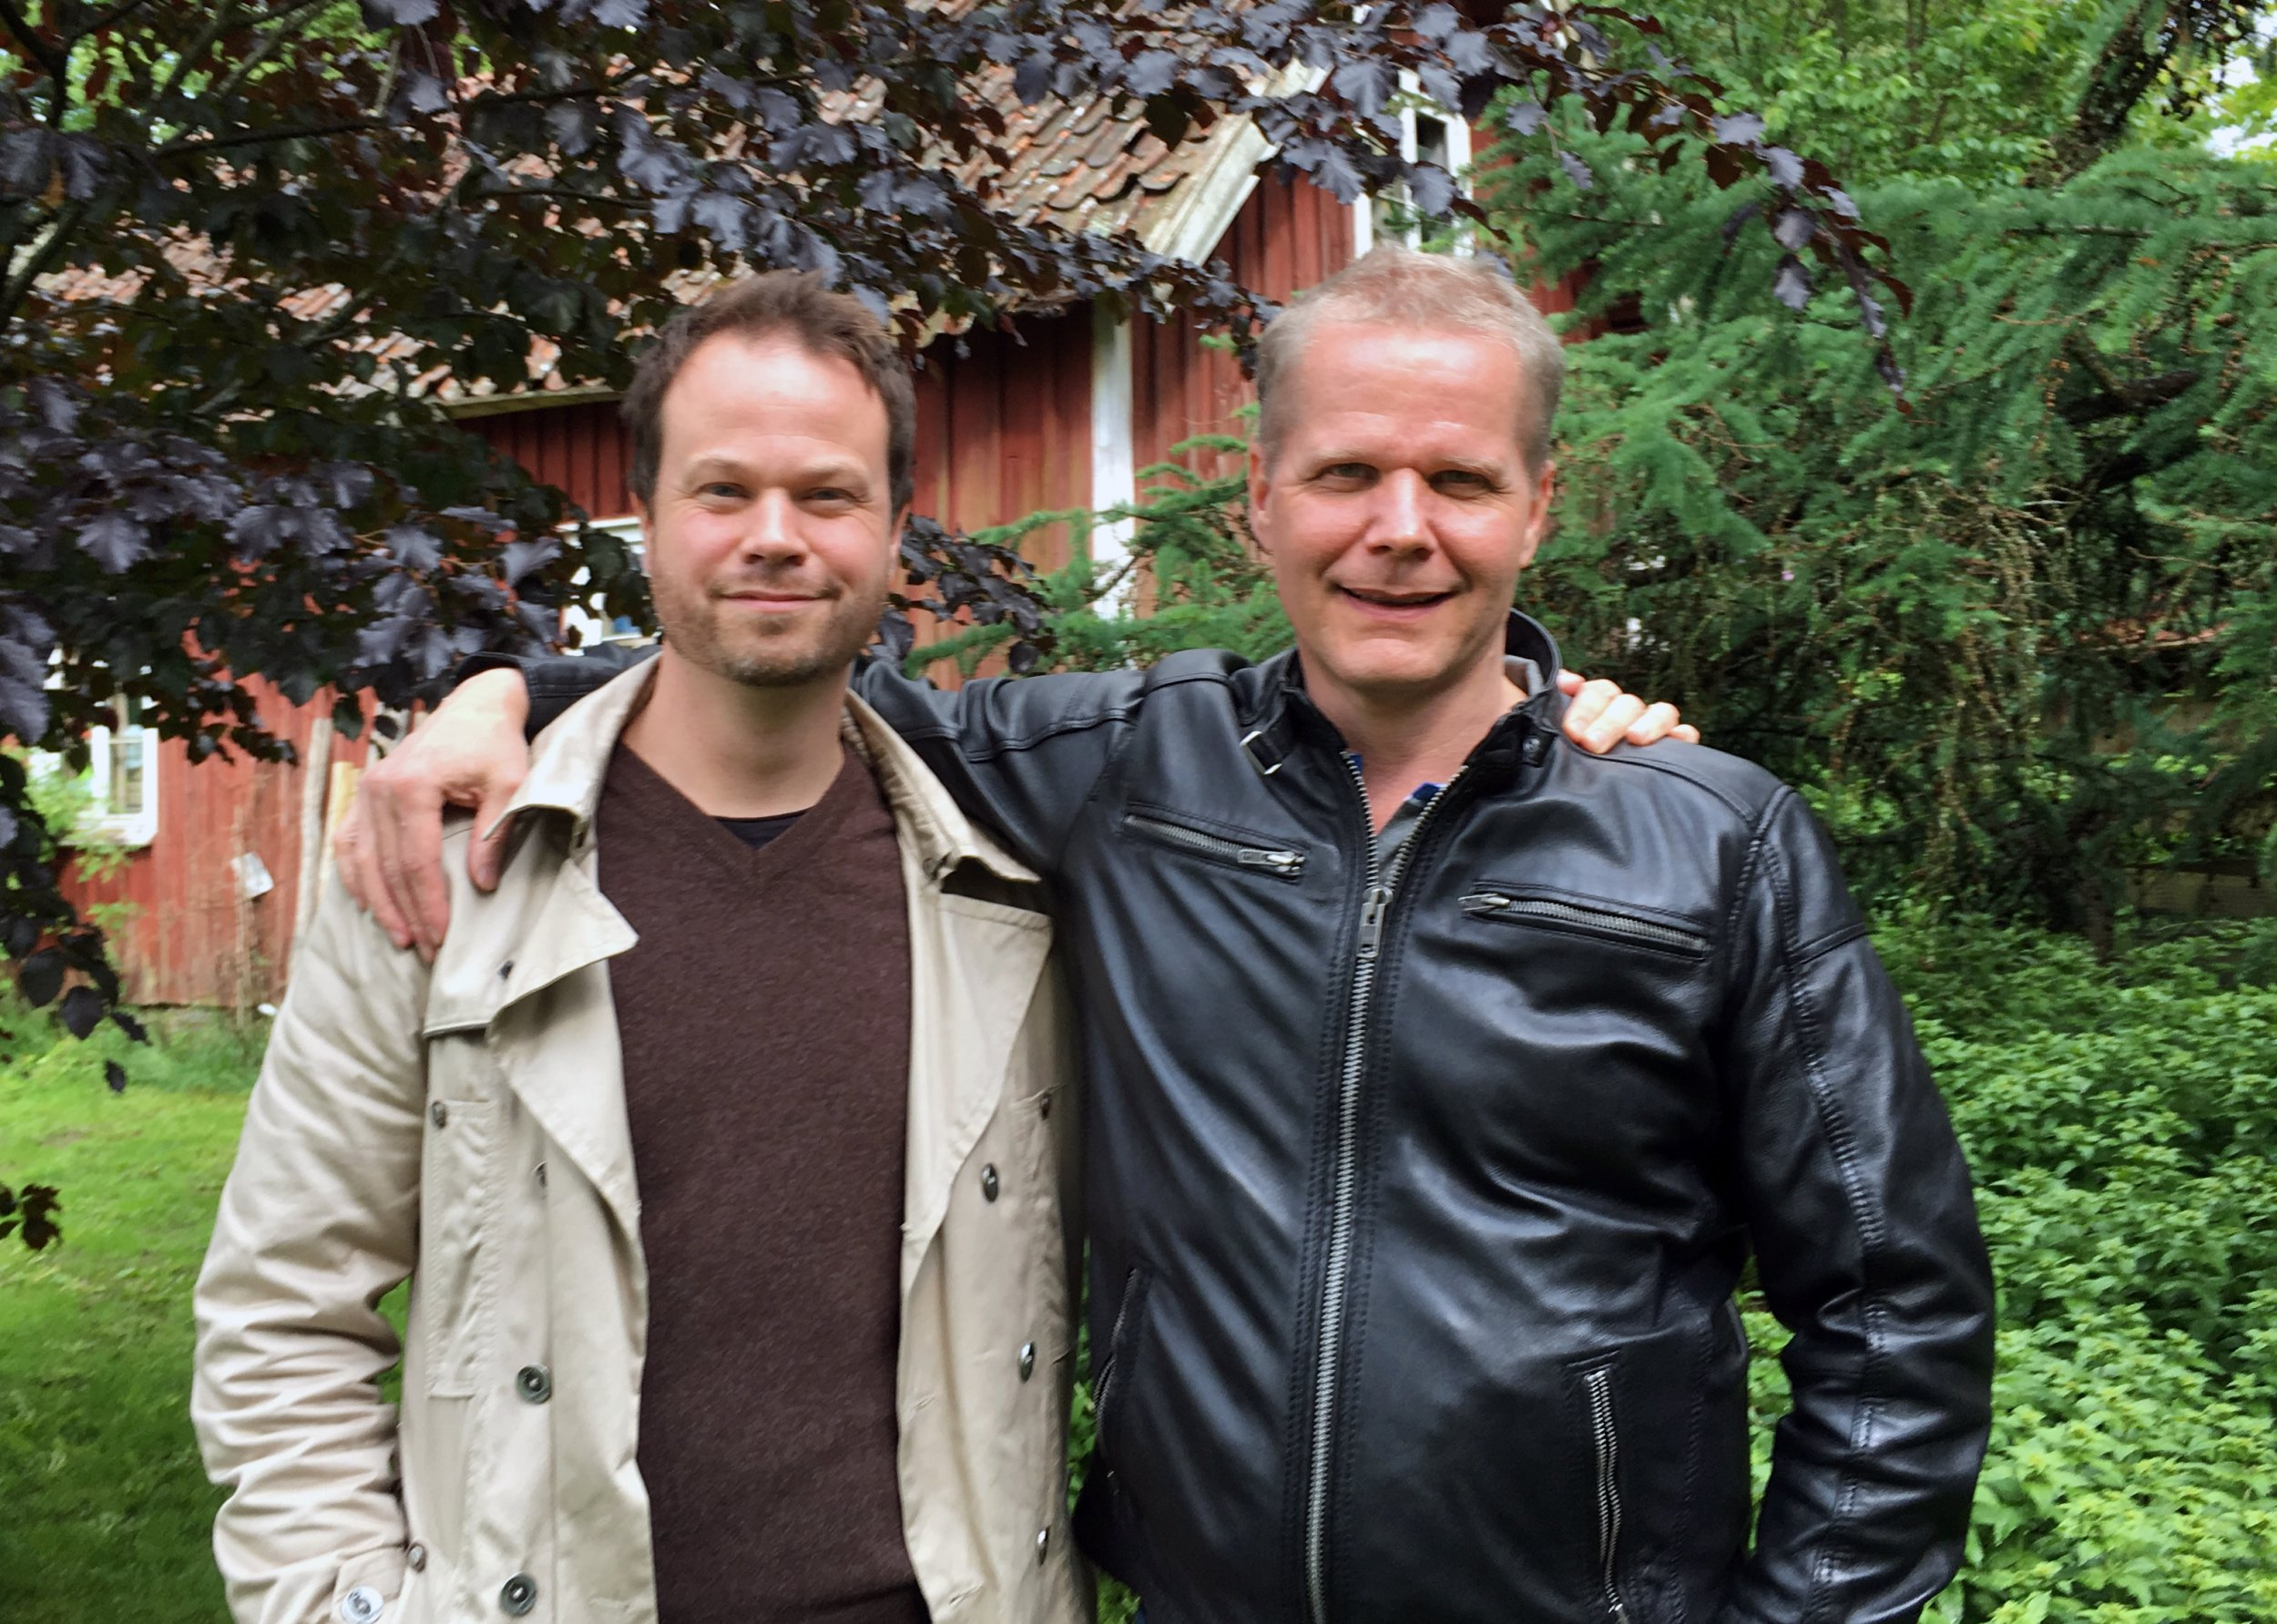 Spår - Anton Berg and Kaj Linna